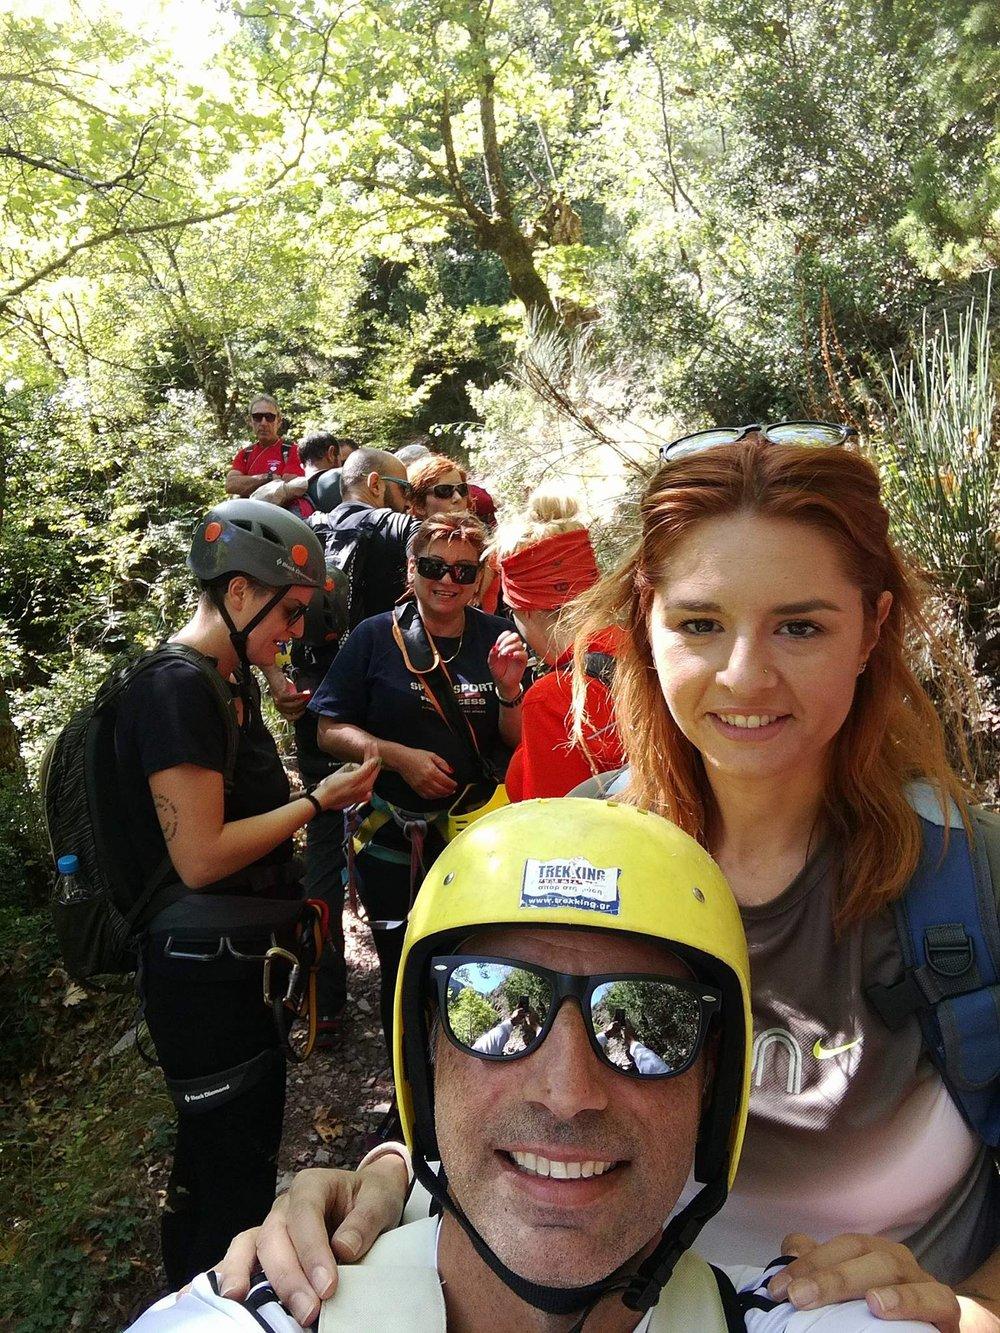 trekking-selfie.jpg